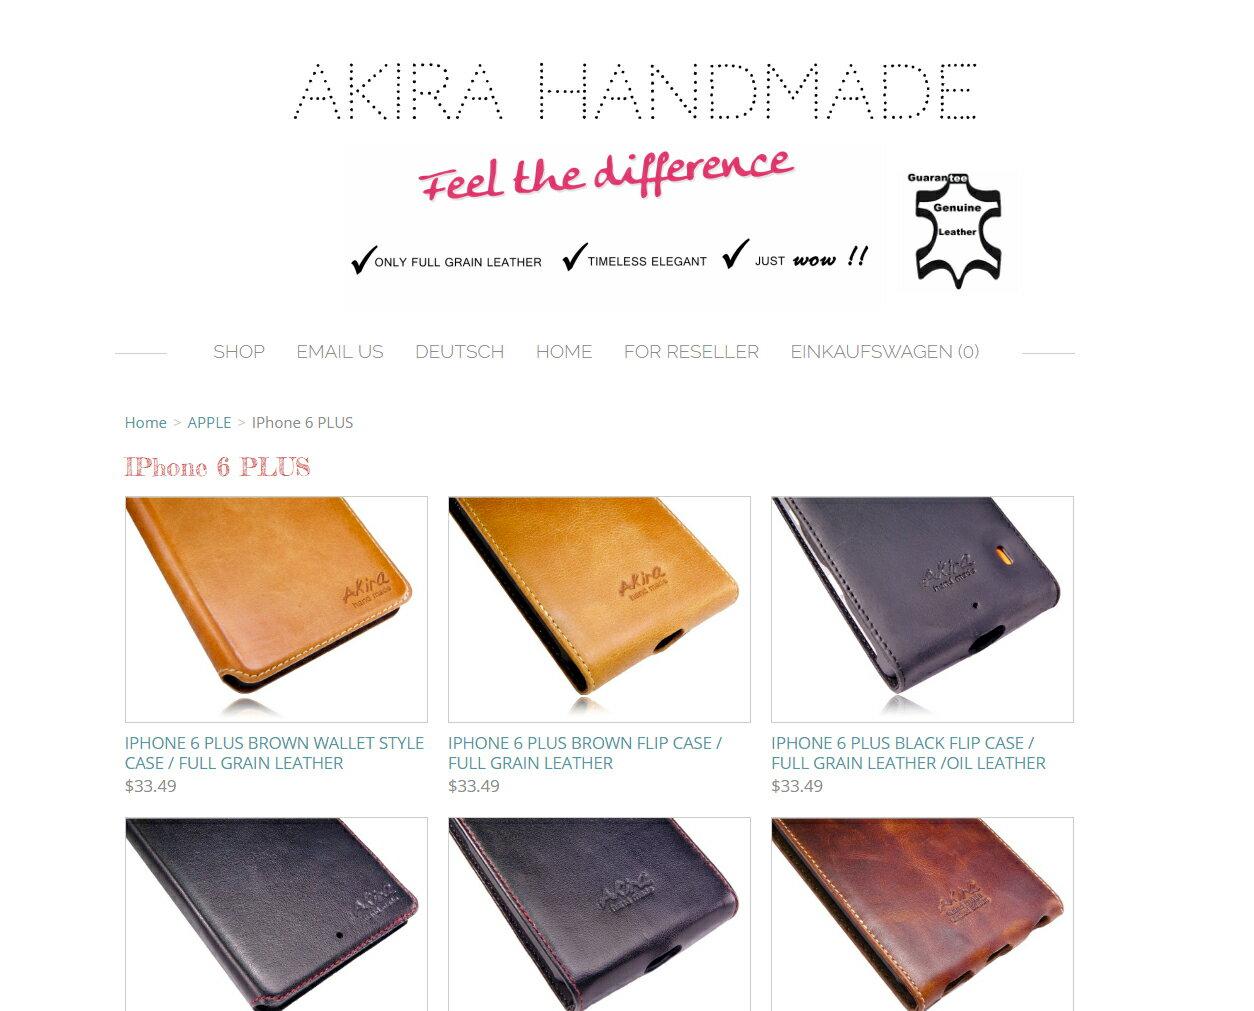 [SONY] Akira手工真皮皮套 [基本款棕色][Z2,Z3,Z4,Z5,Z5+,Z5C,C4] 7